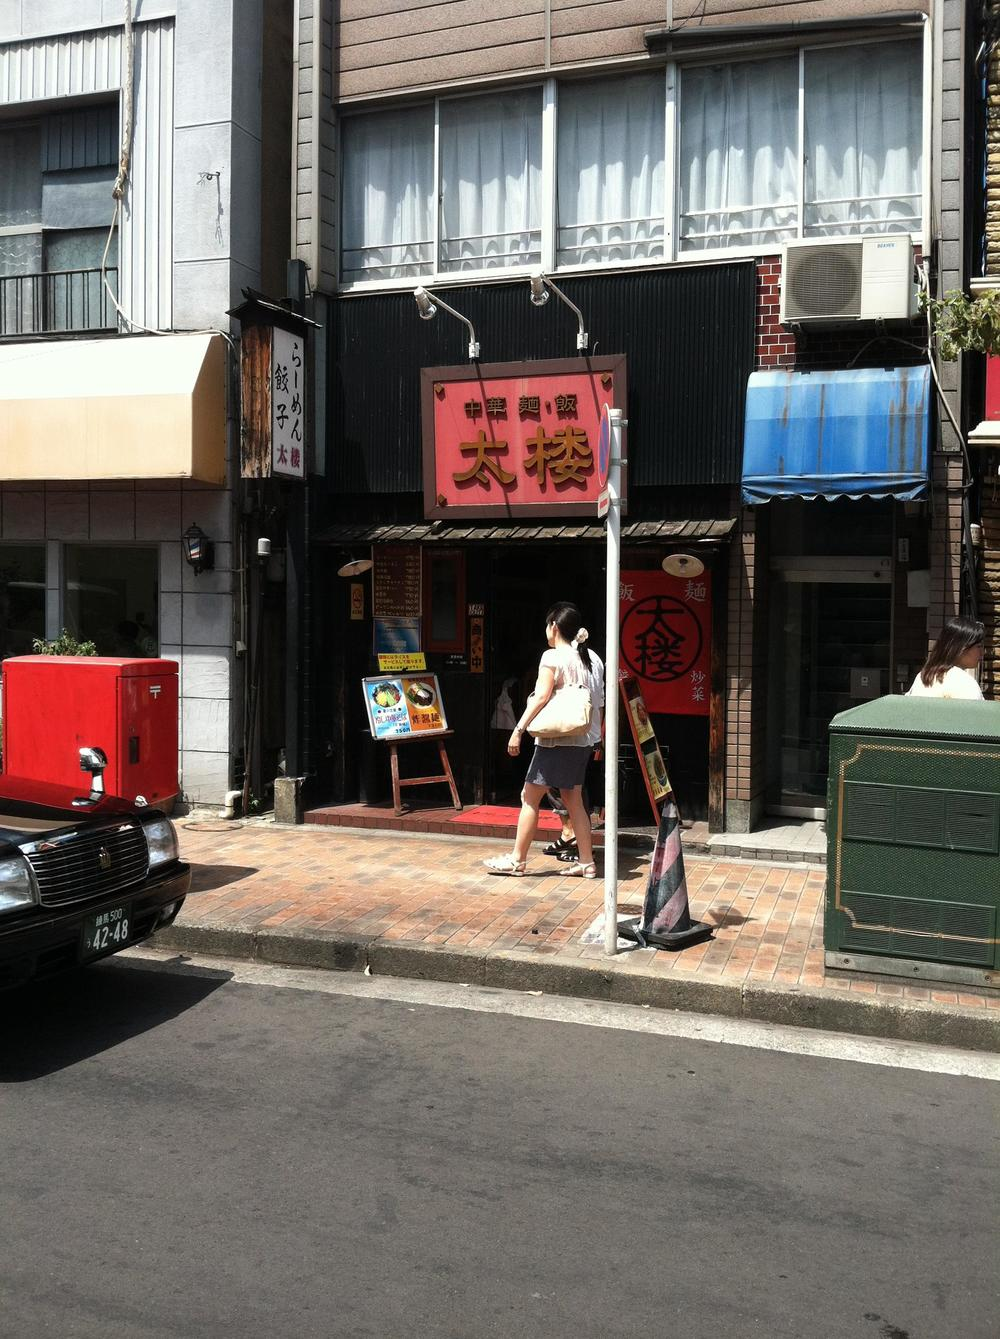 The Local Ramen Shop